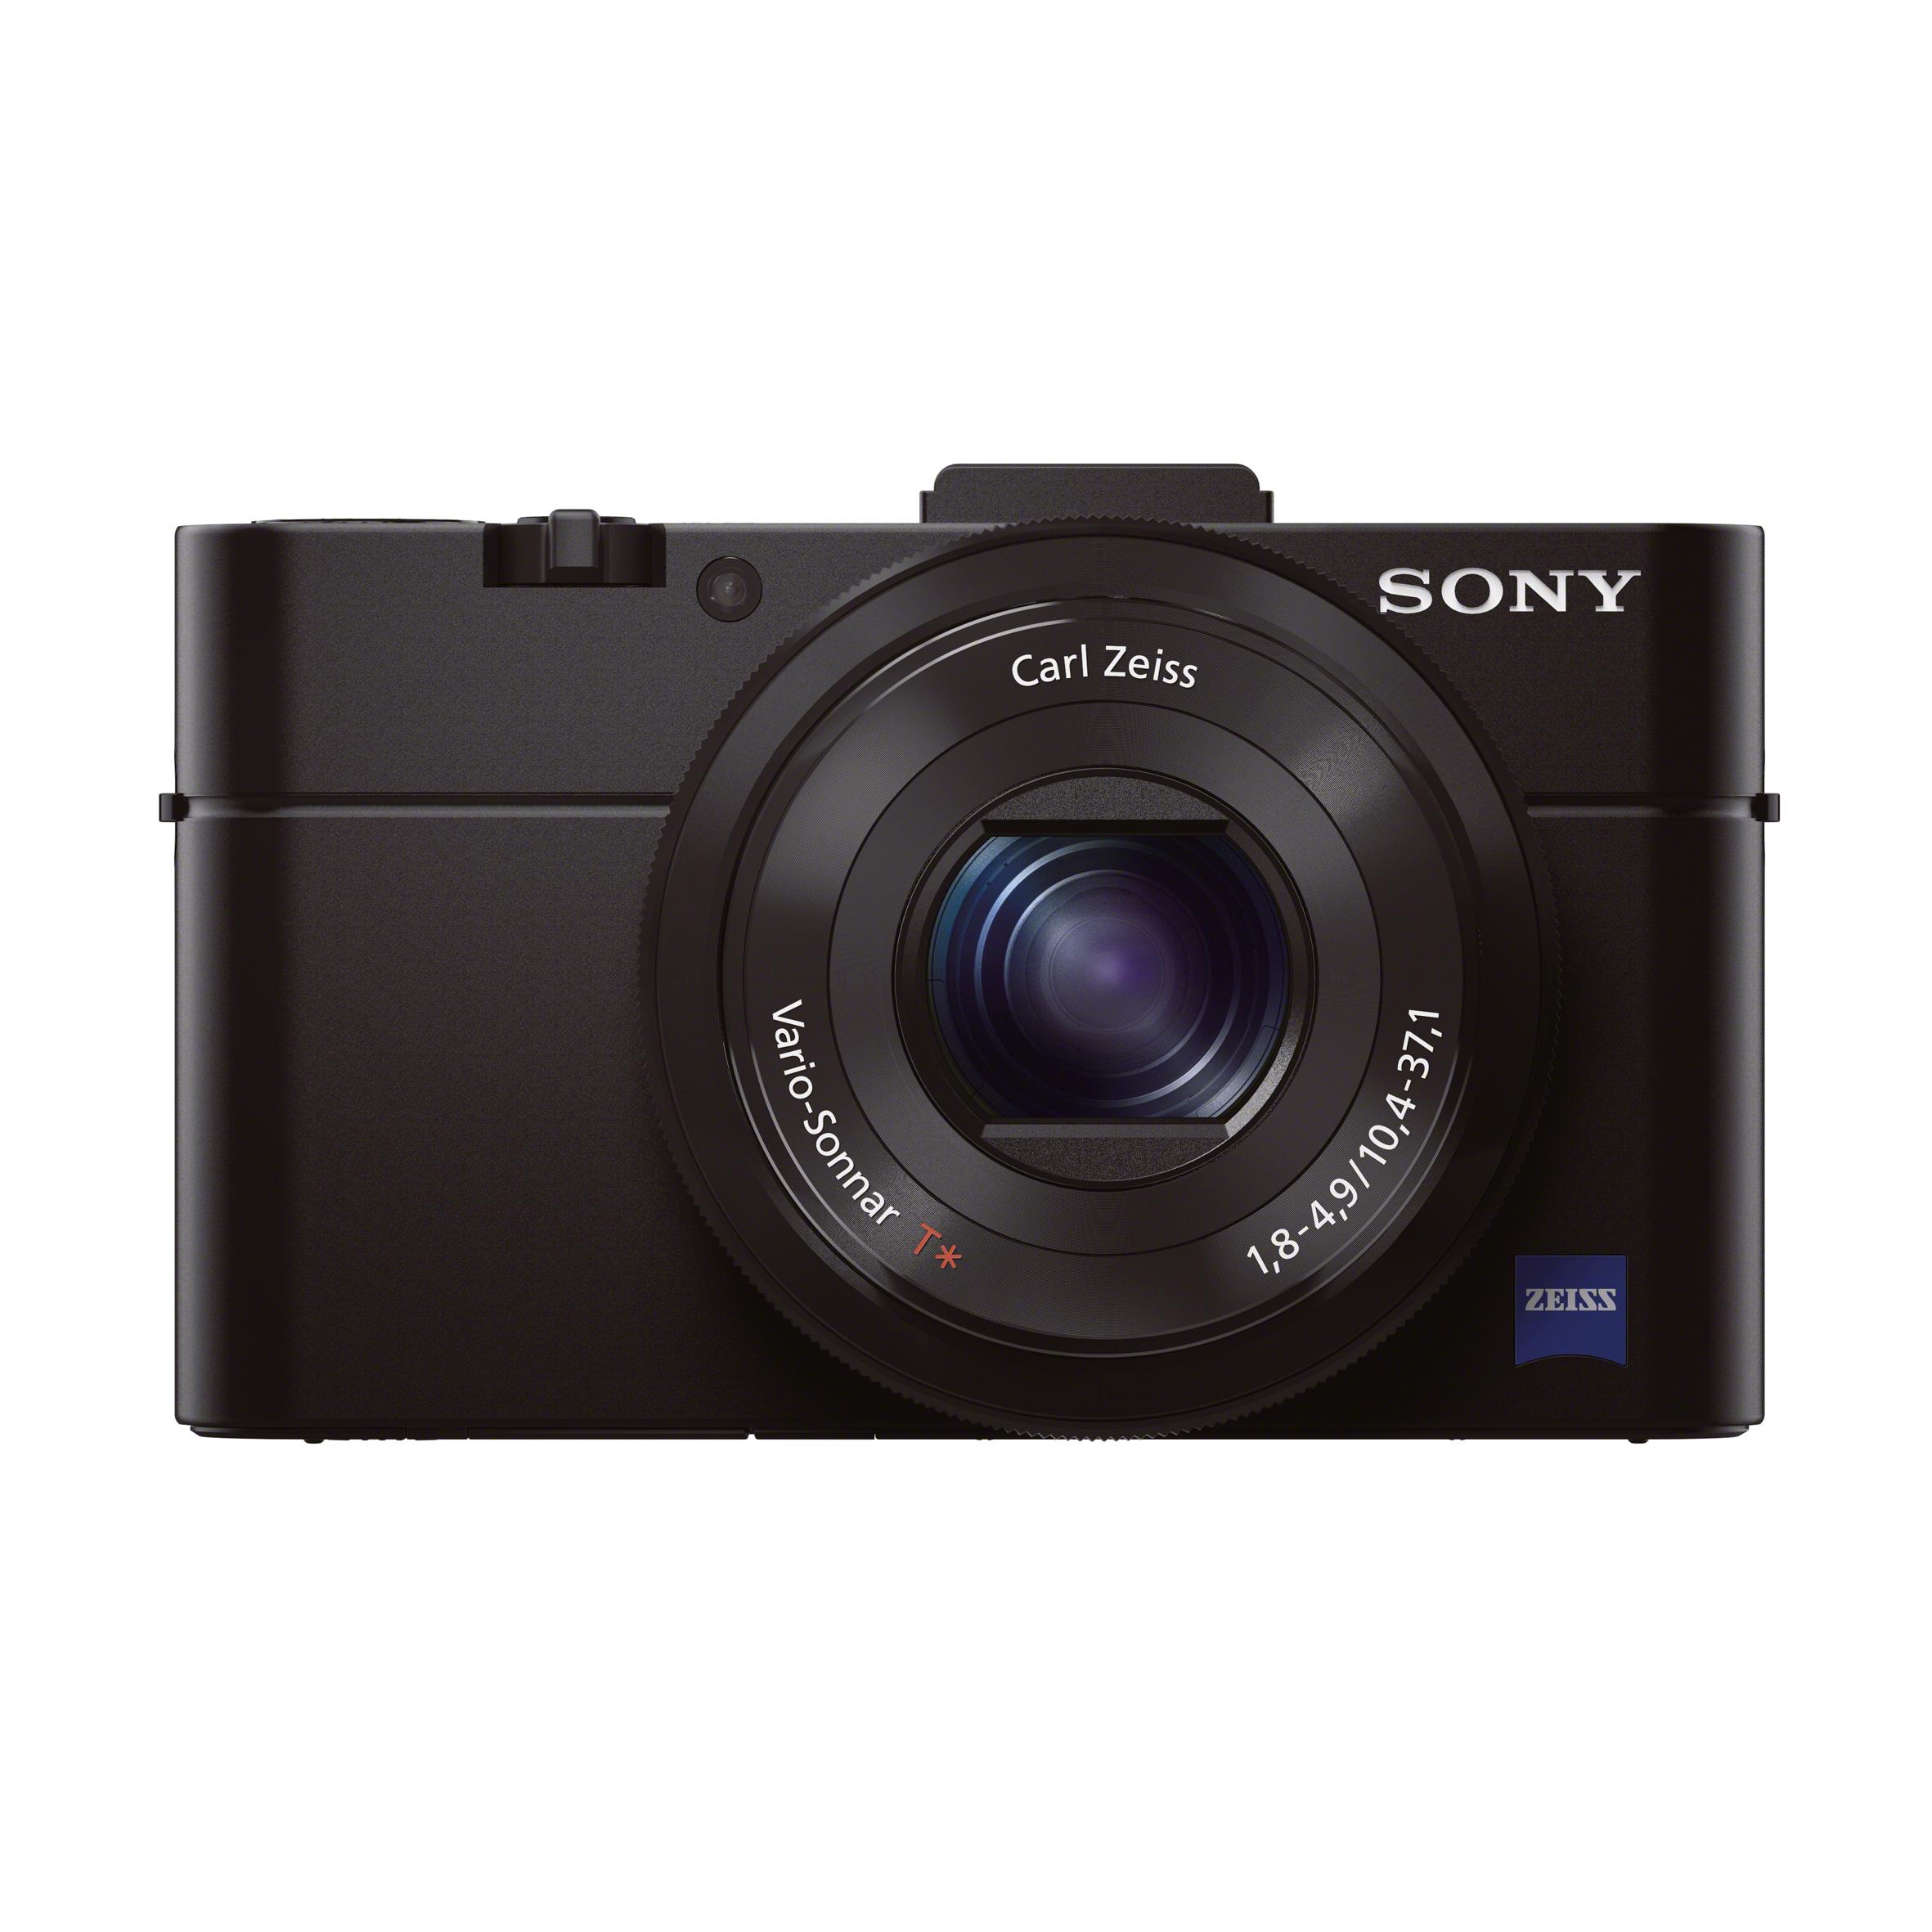 Sony DSC-RX100 Mark II Foto Gregor Photokina Sale